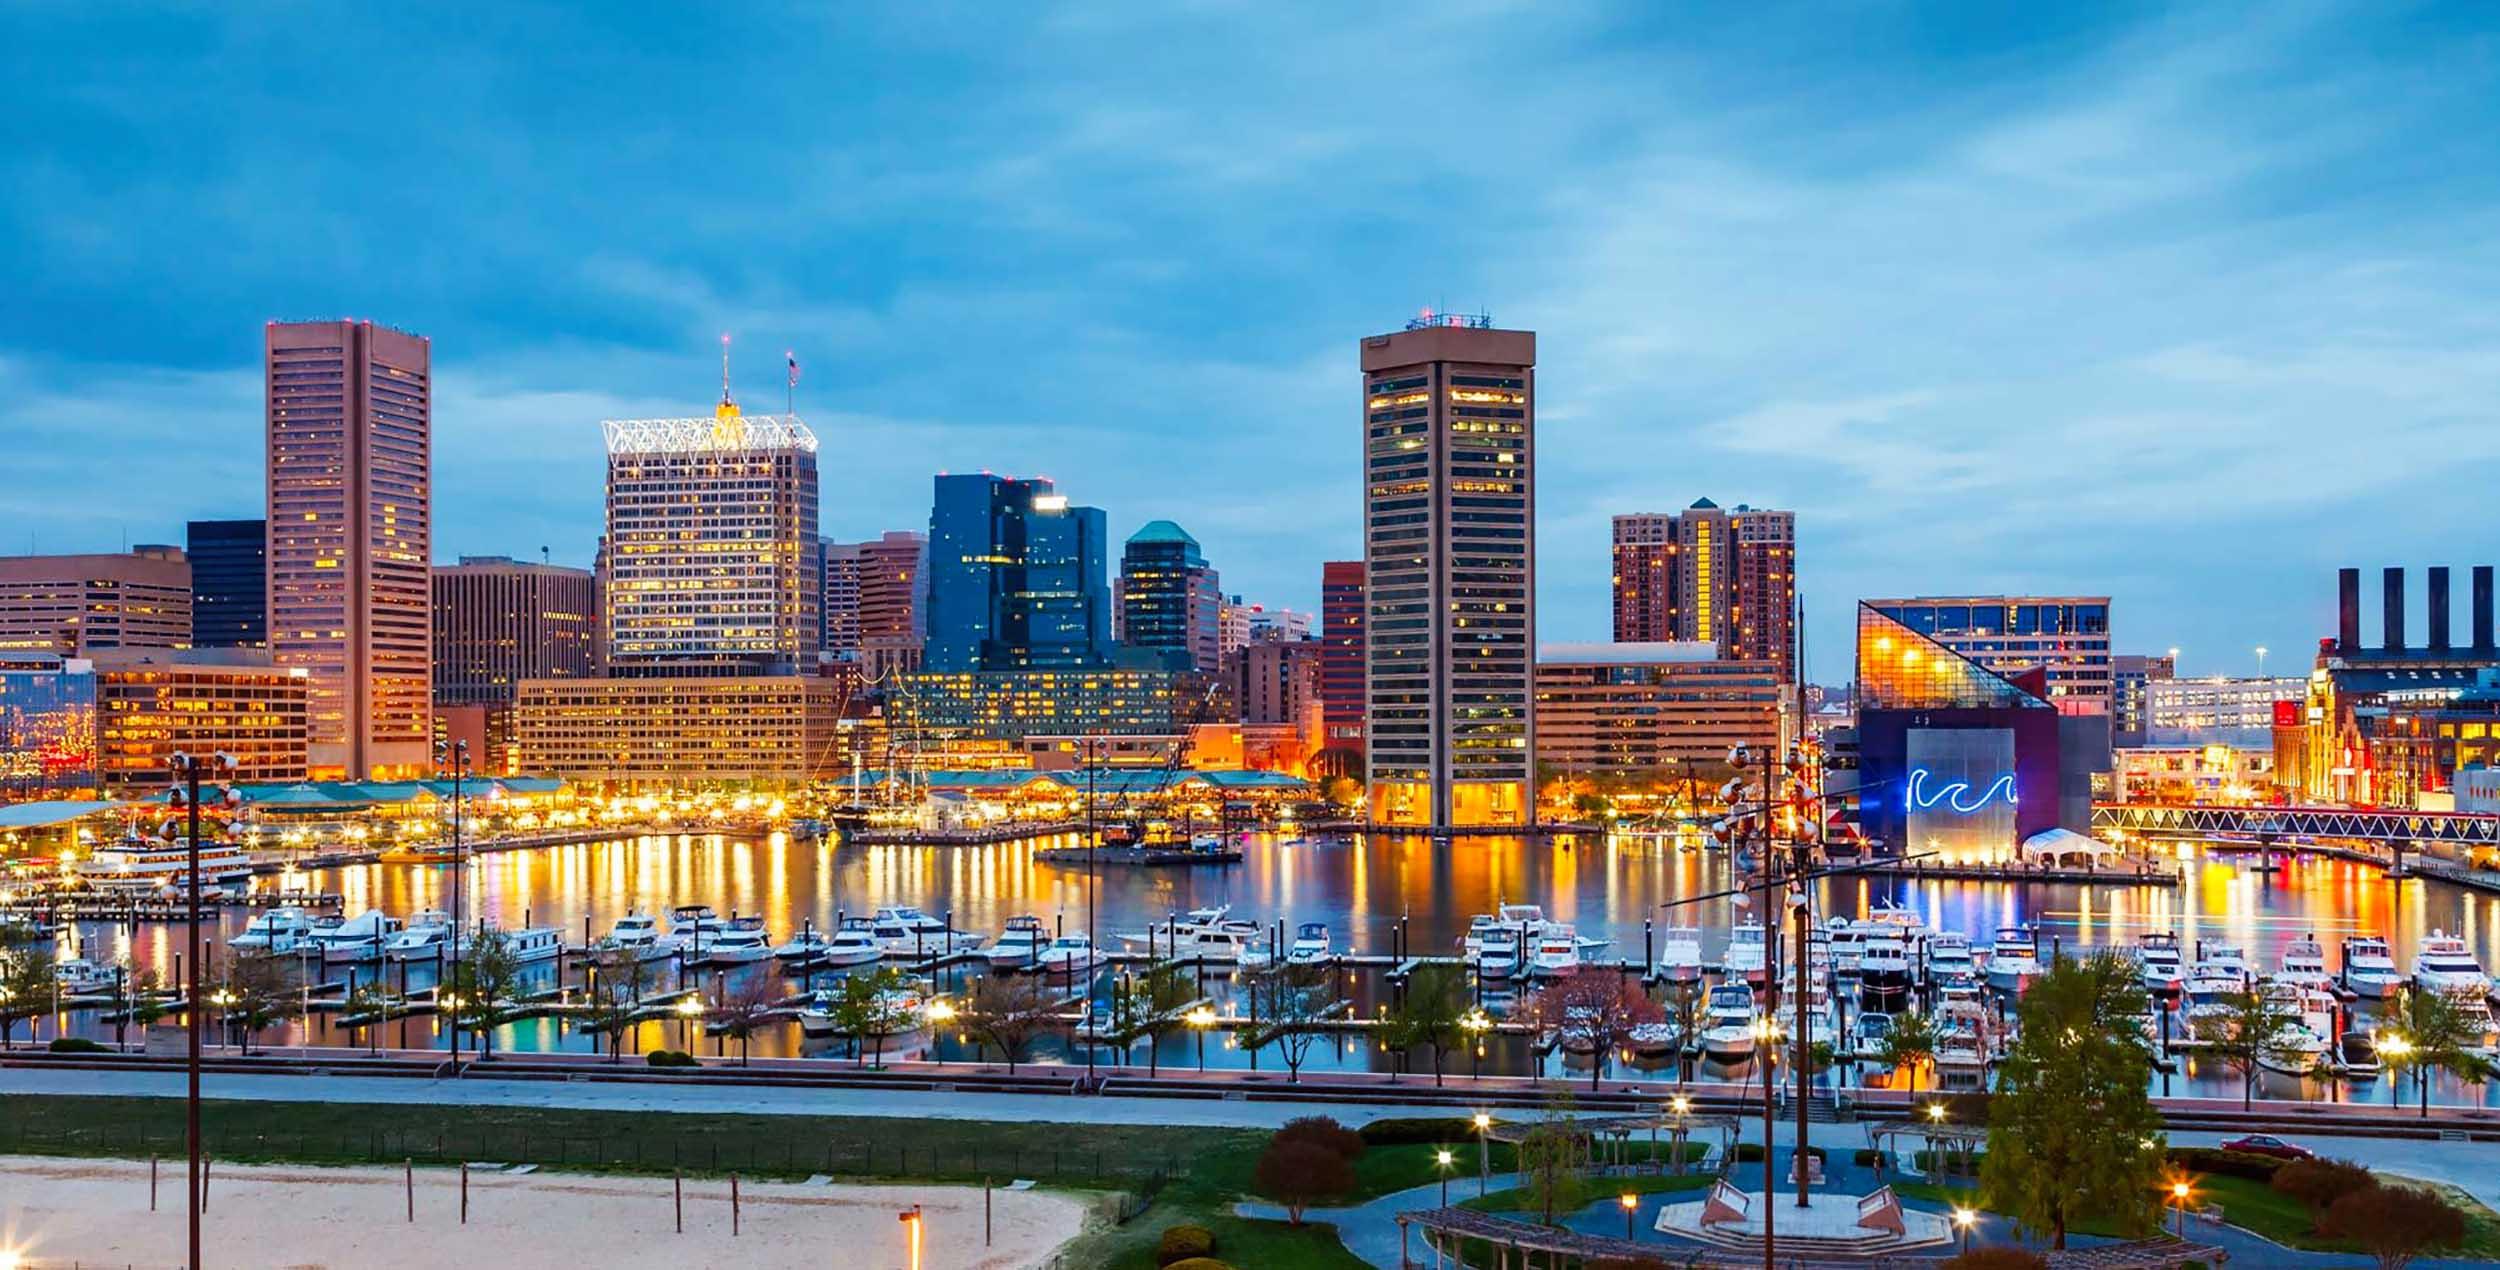 6-Baltimore-Maryland.jpg